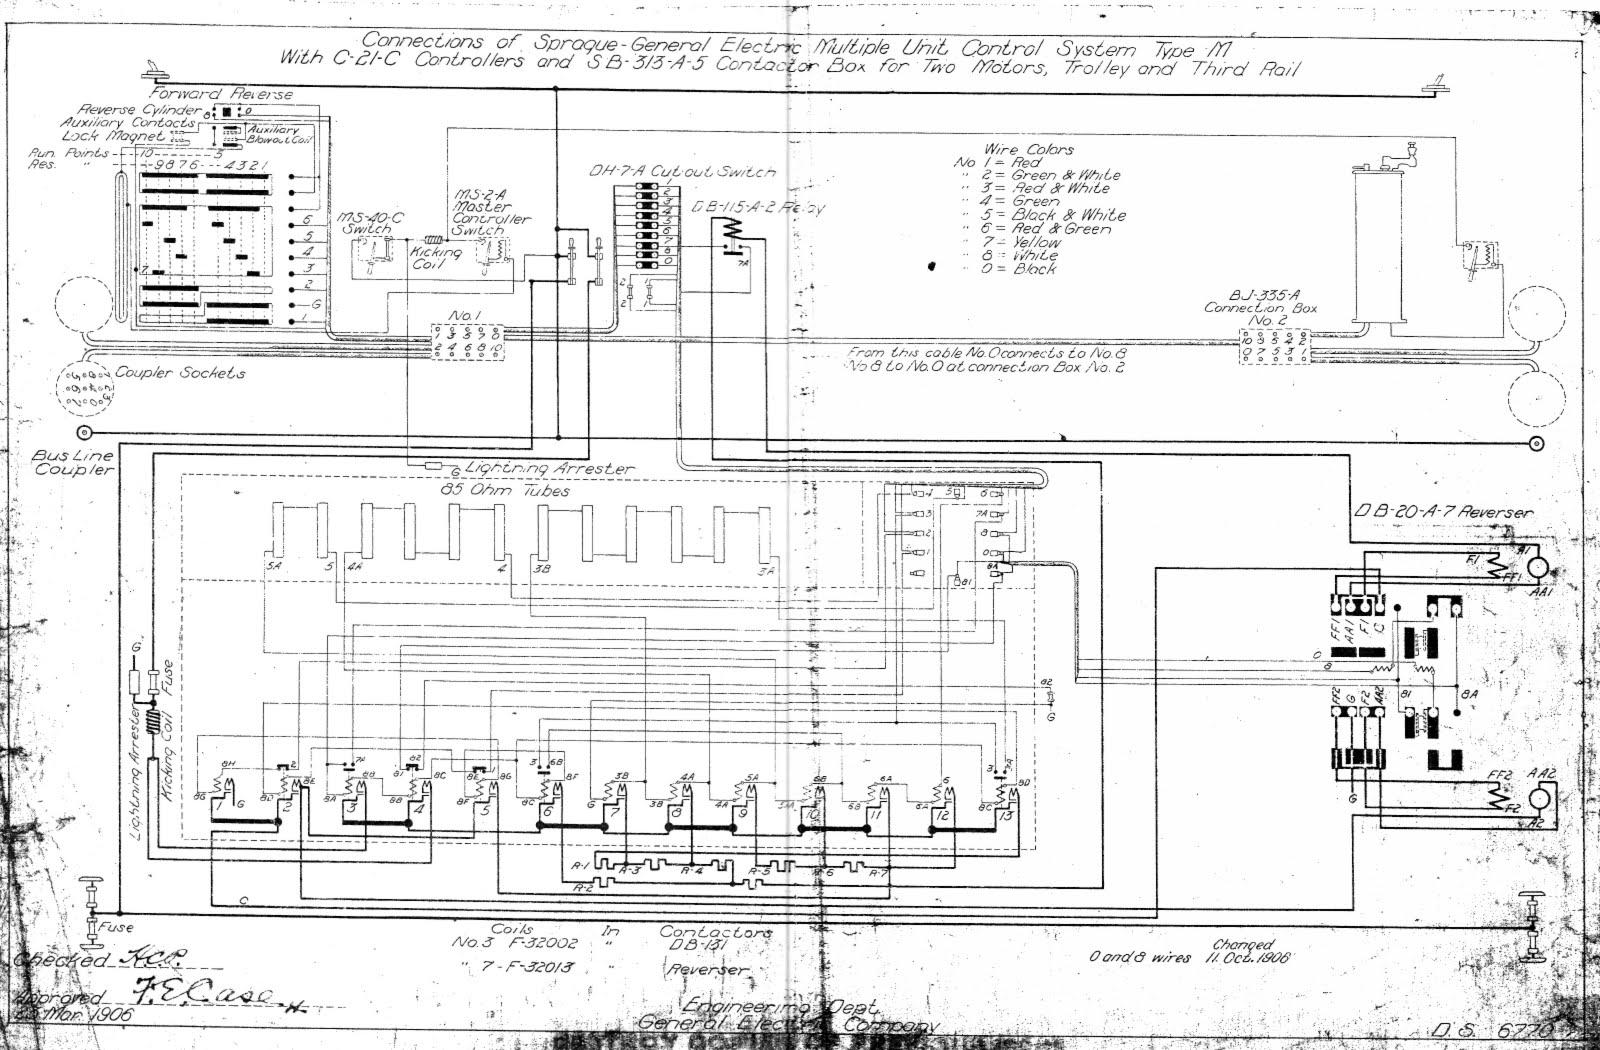 Kenworth W900 Engine Wiring Diagram